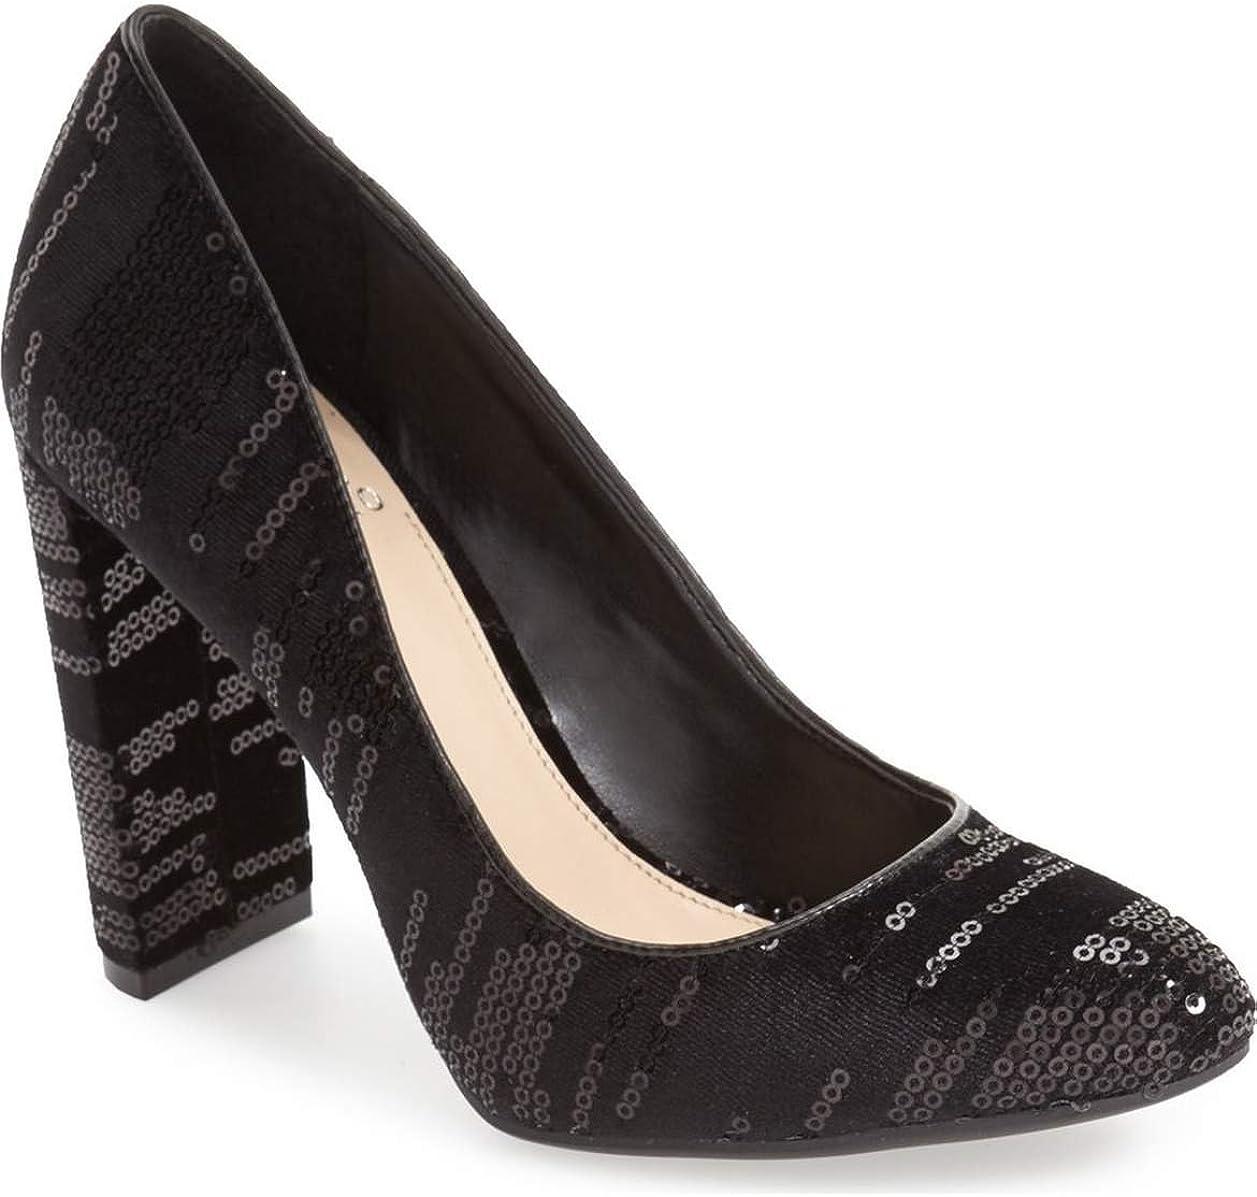 High Heel Pump Shoes Sparkle Sequin